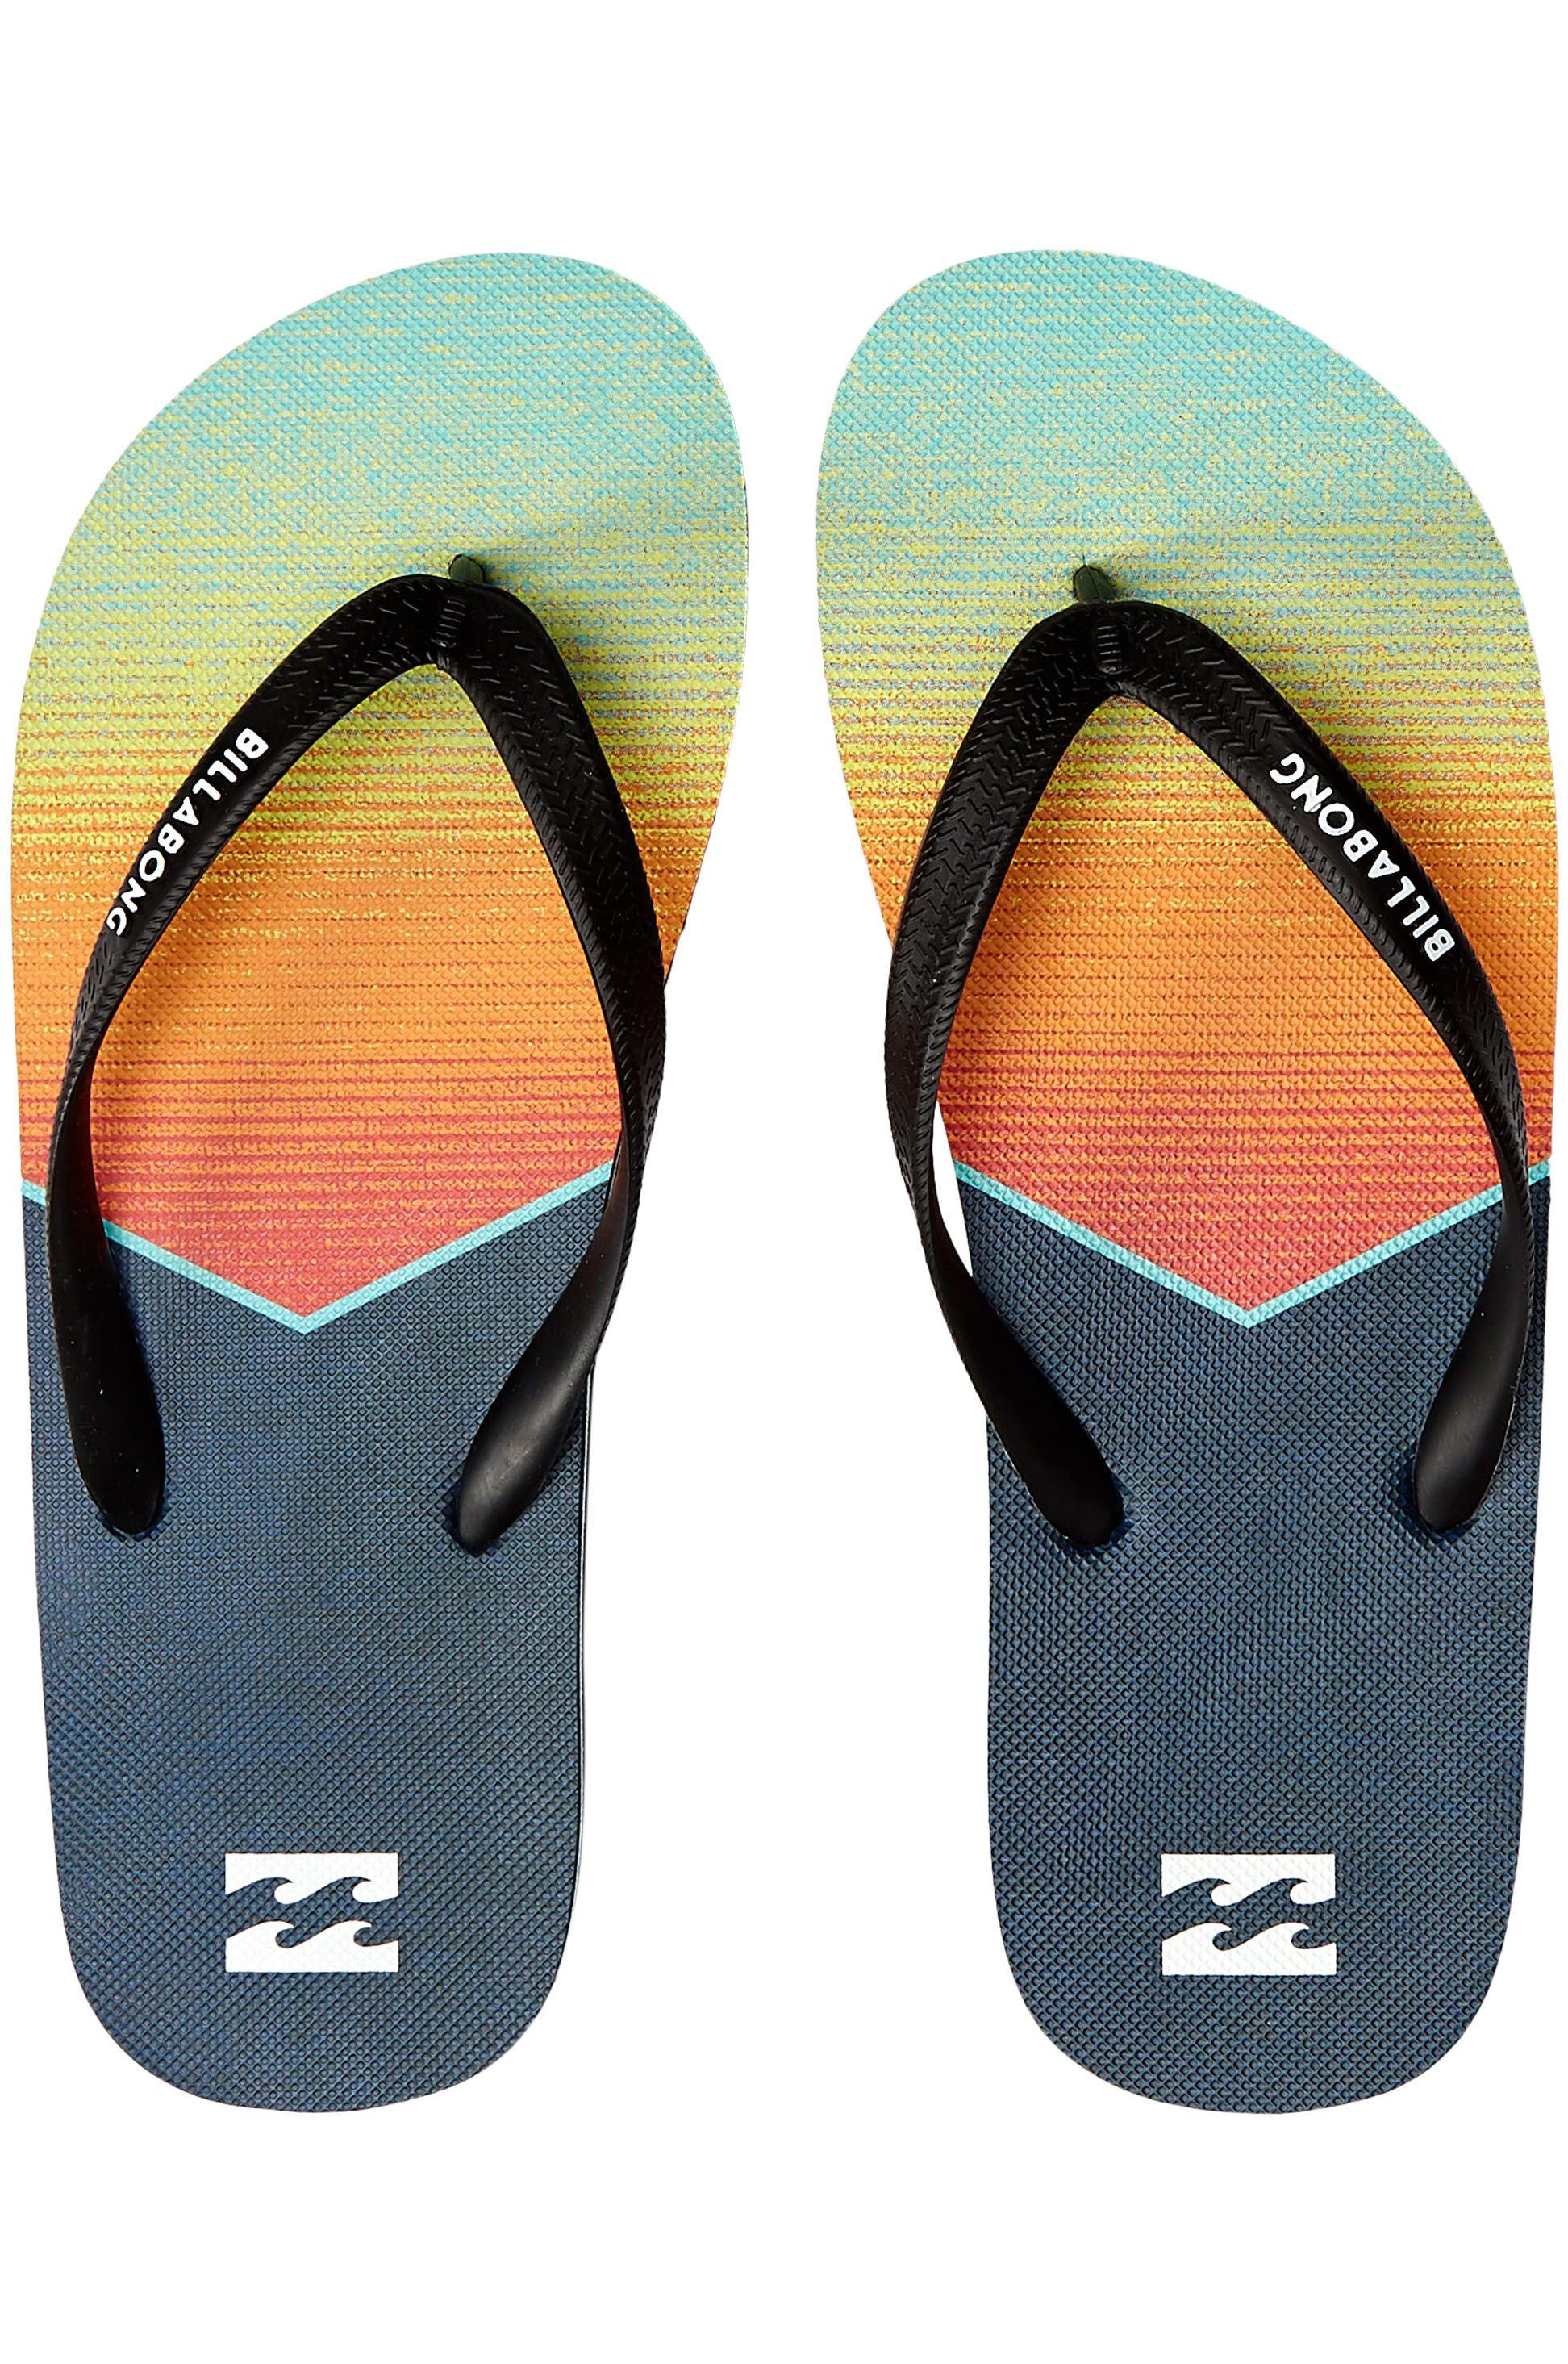 Billabong Sandals TIDES NORTHPOINT Orange